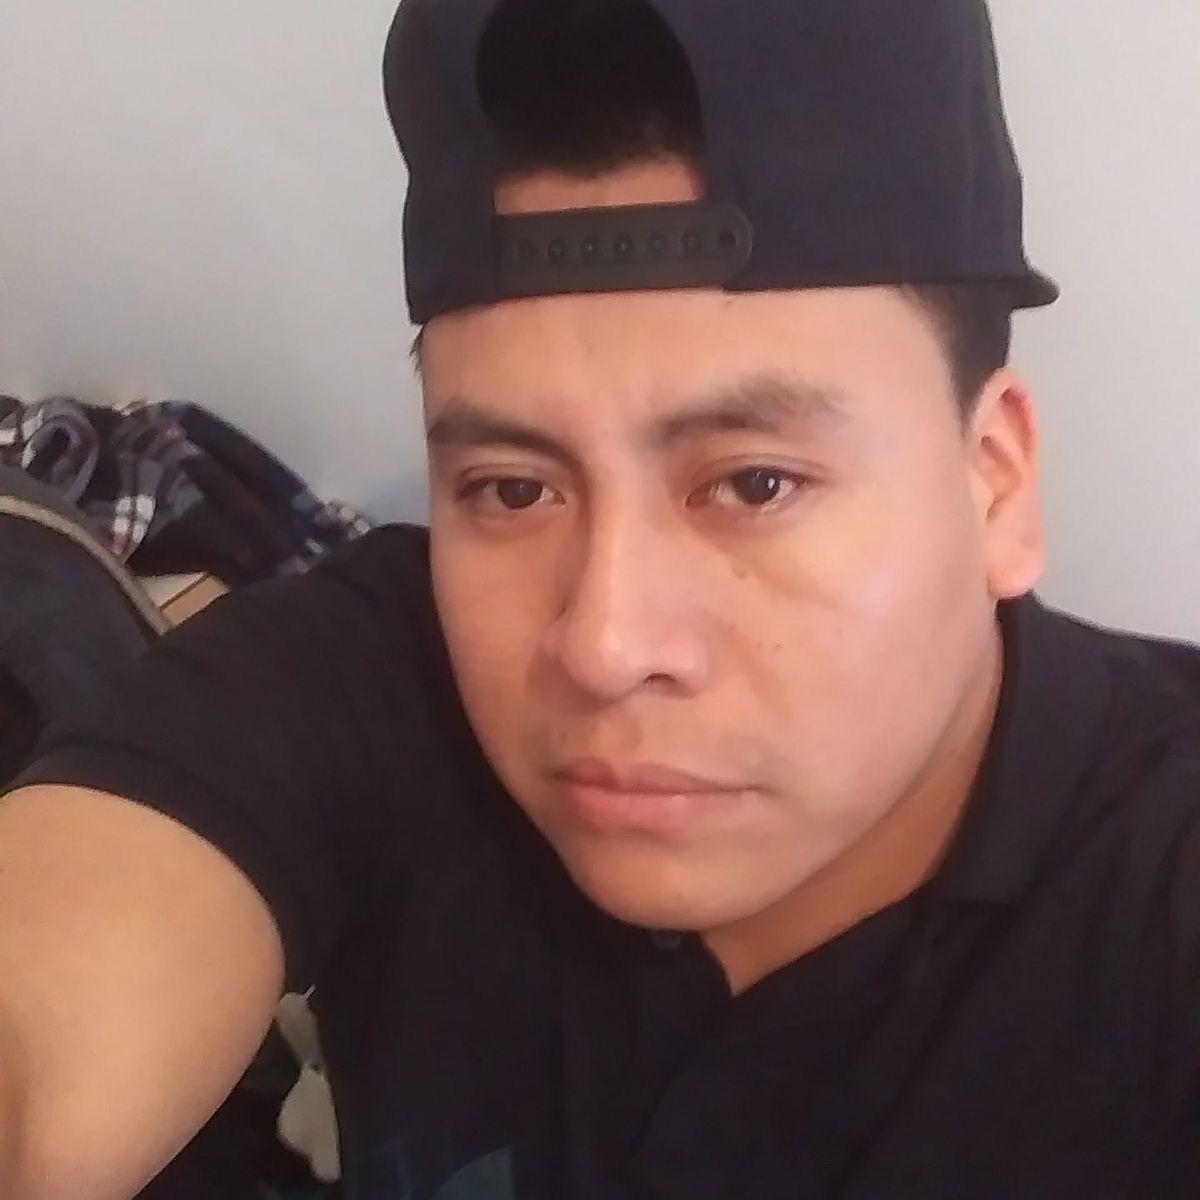 A photo of a man named Francisco Villalva Vitinio, killed in an armed robbery